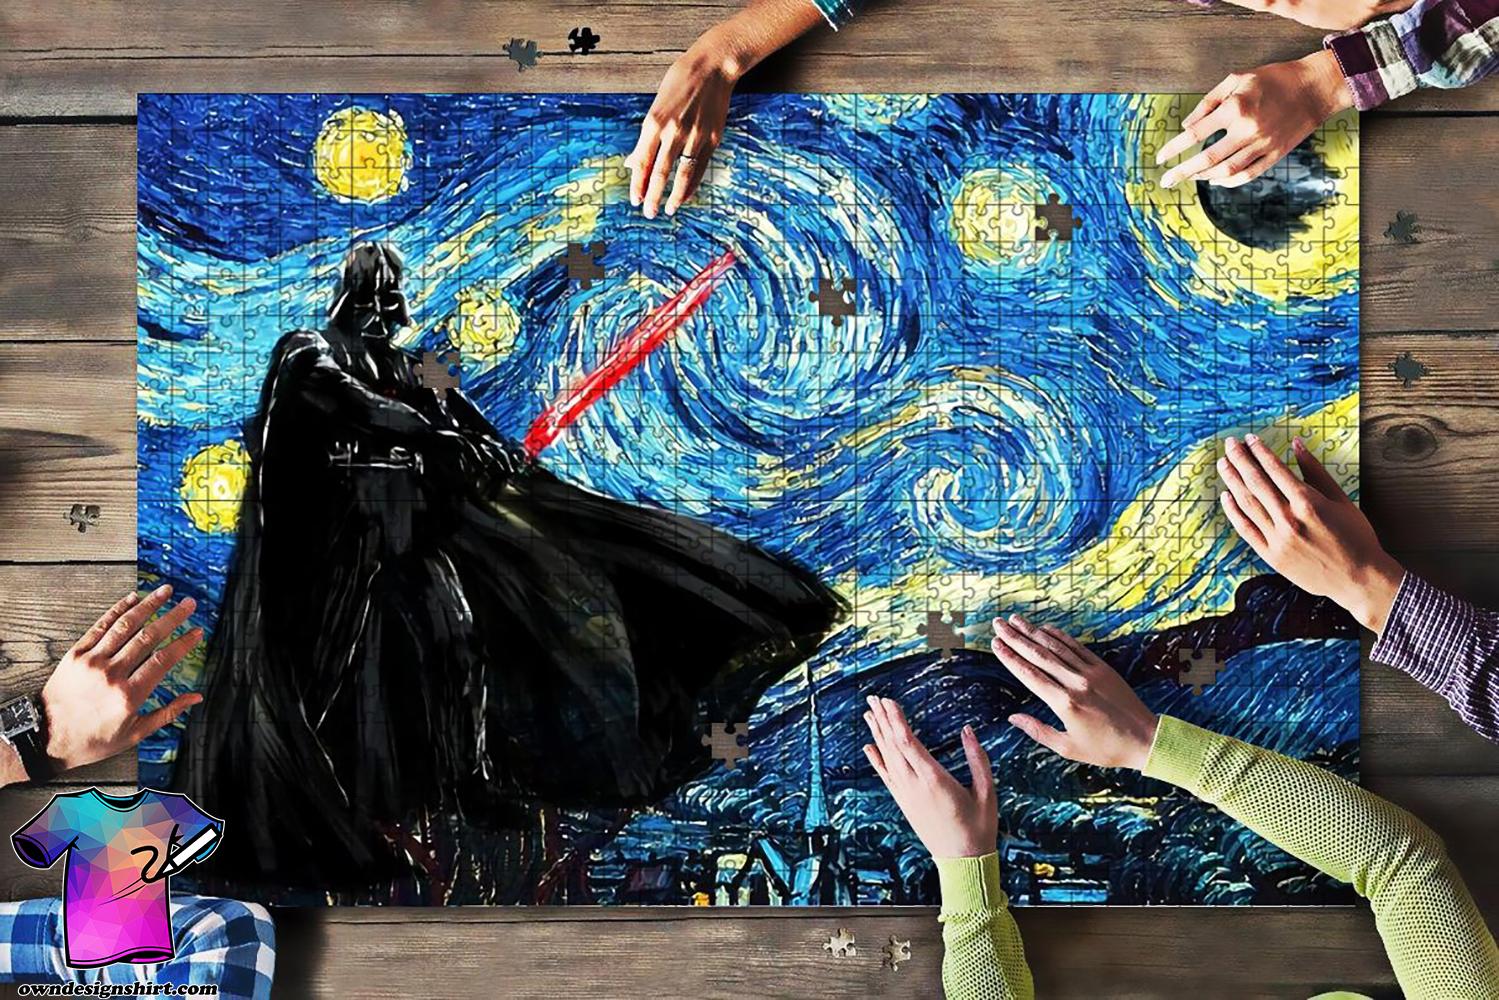 Vincent van gogh starry night darth vader star wars jigsaw puzzle